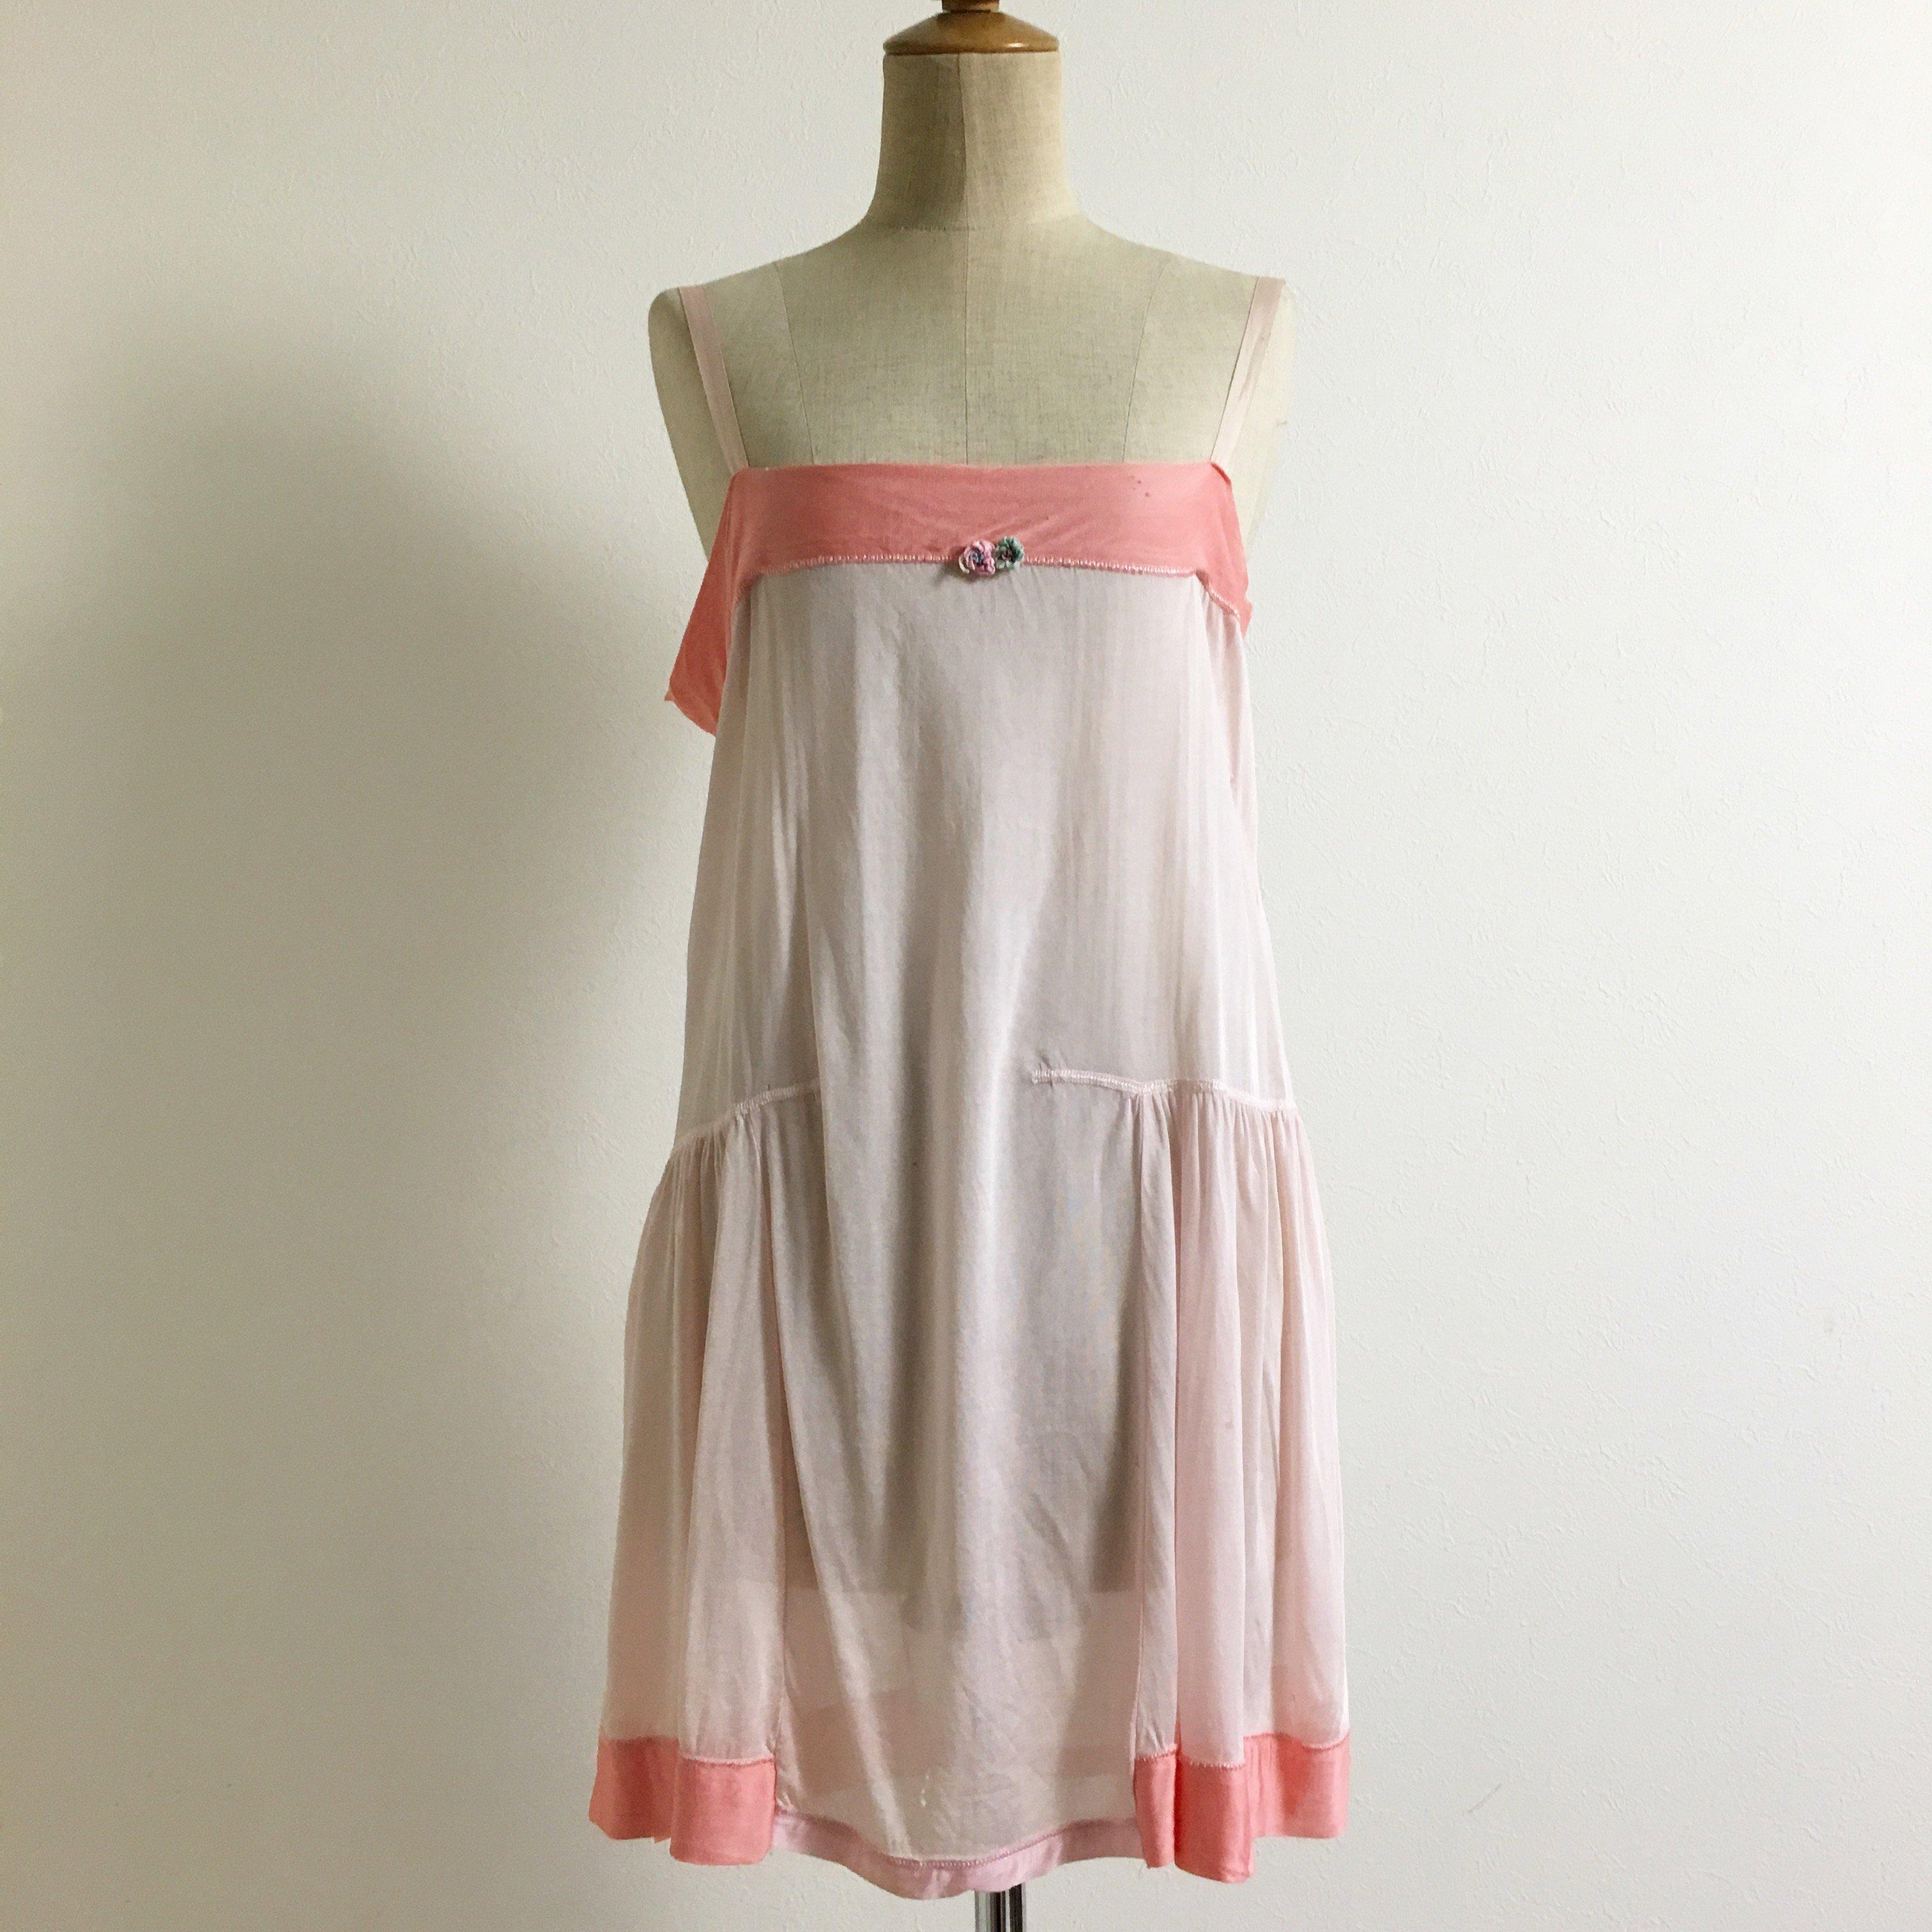 vintage slip lingerie